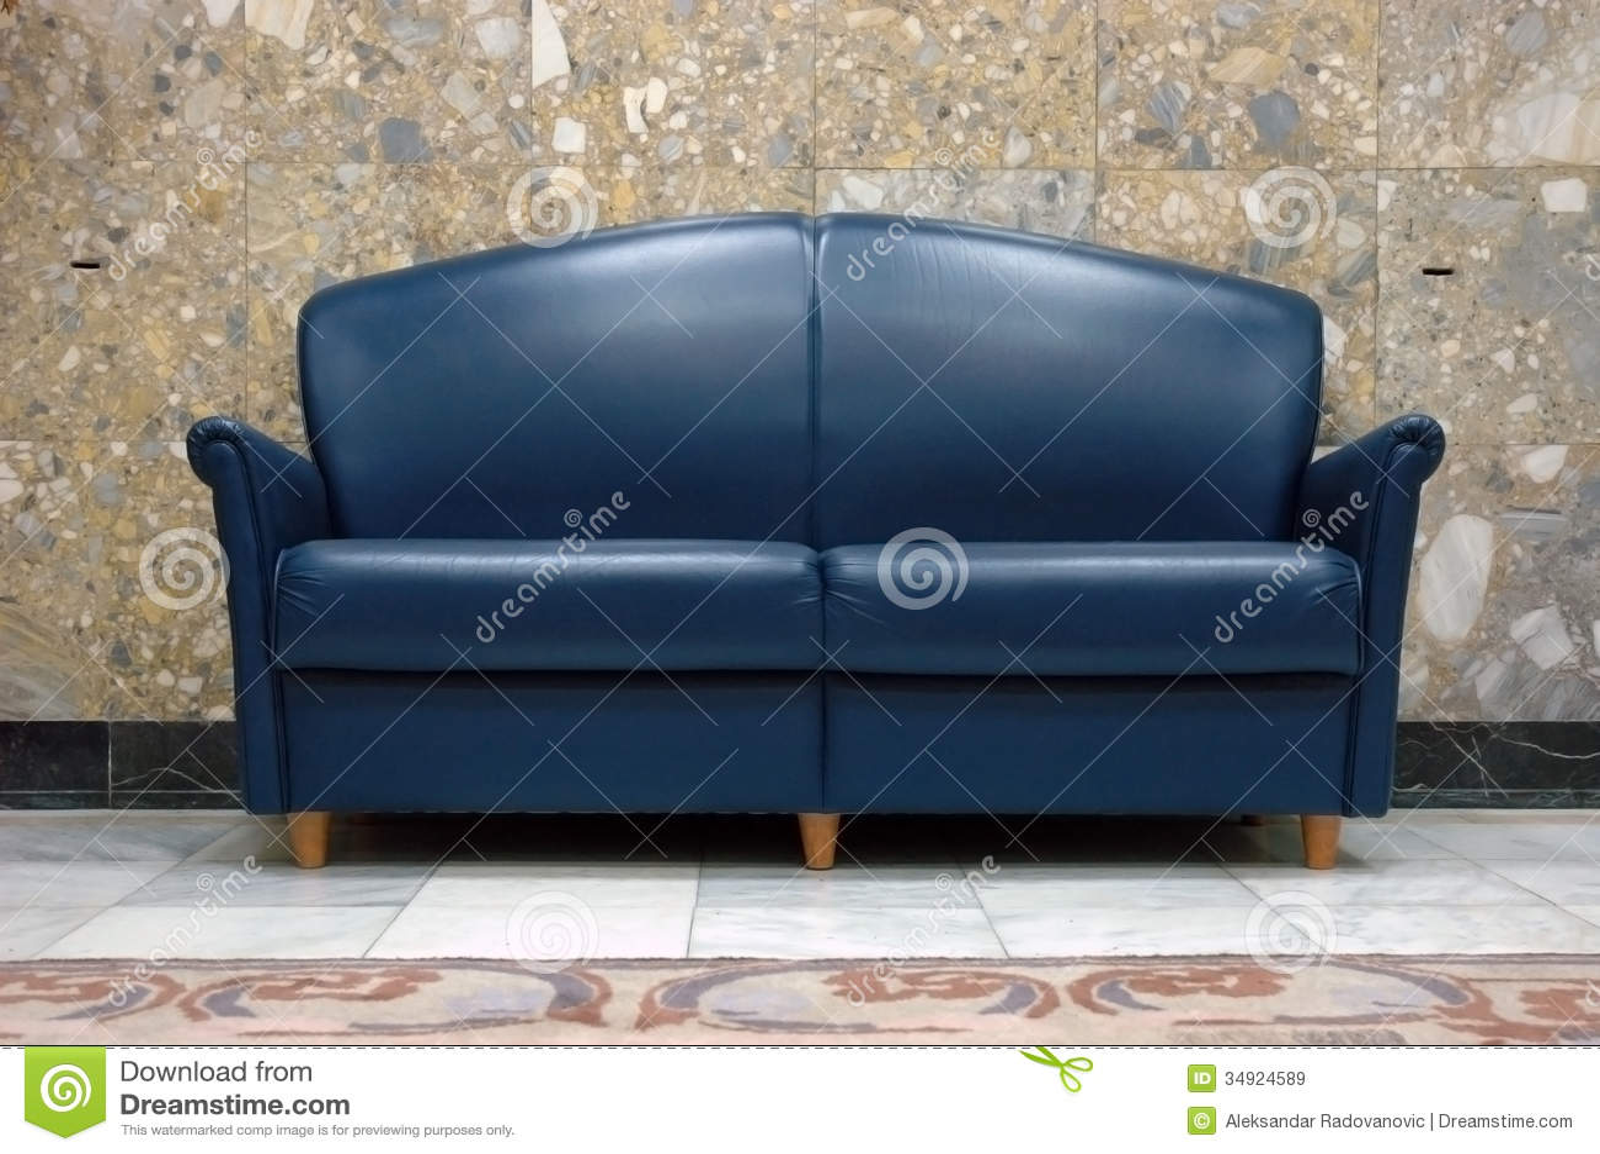 Blue leather sofa stock image Image of room lifestyle  34924589